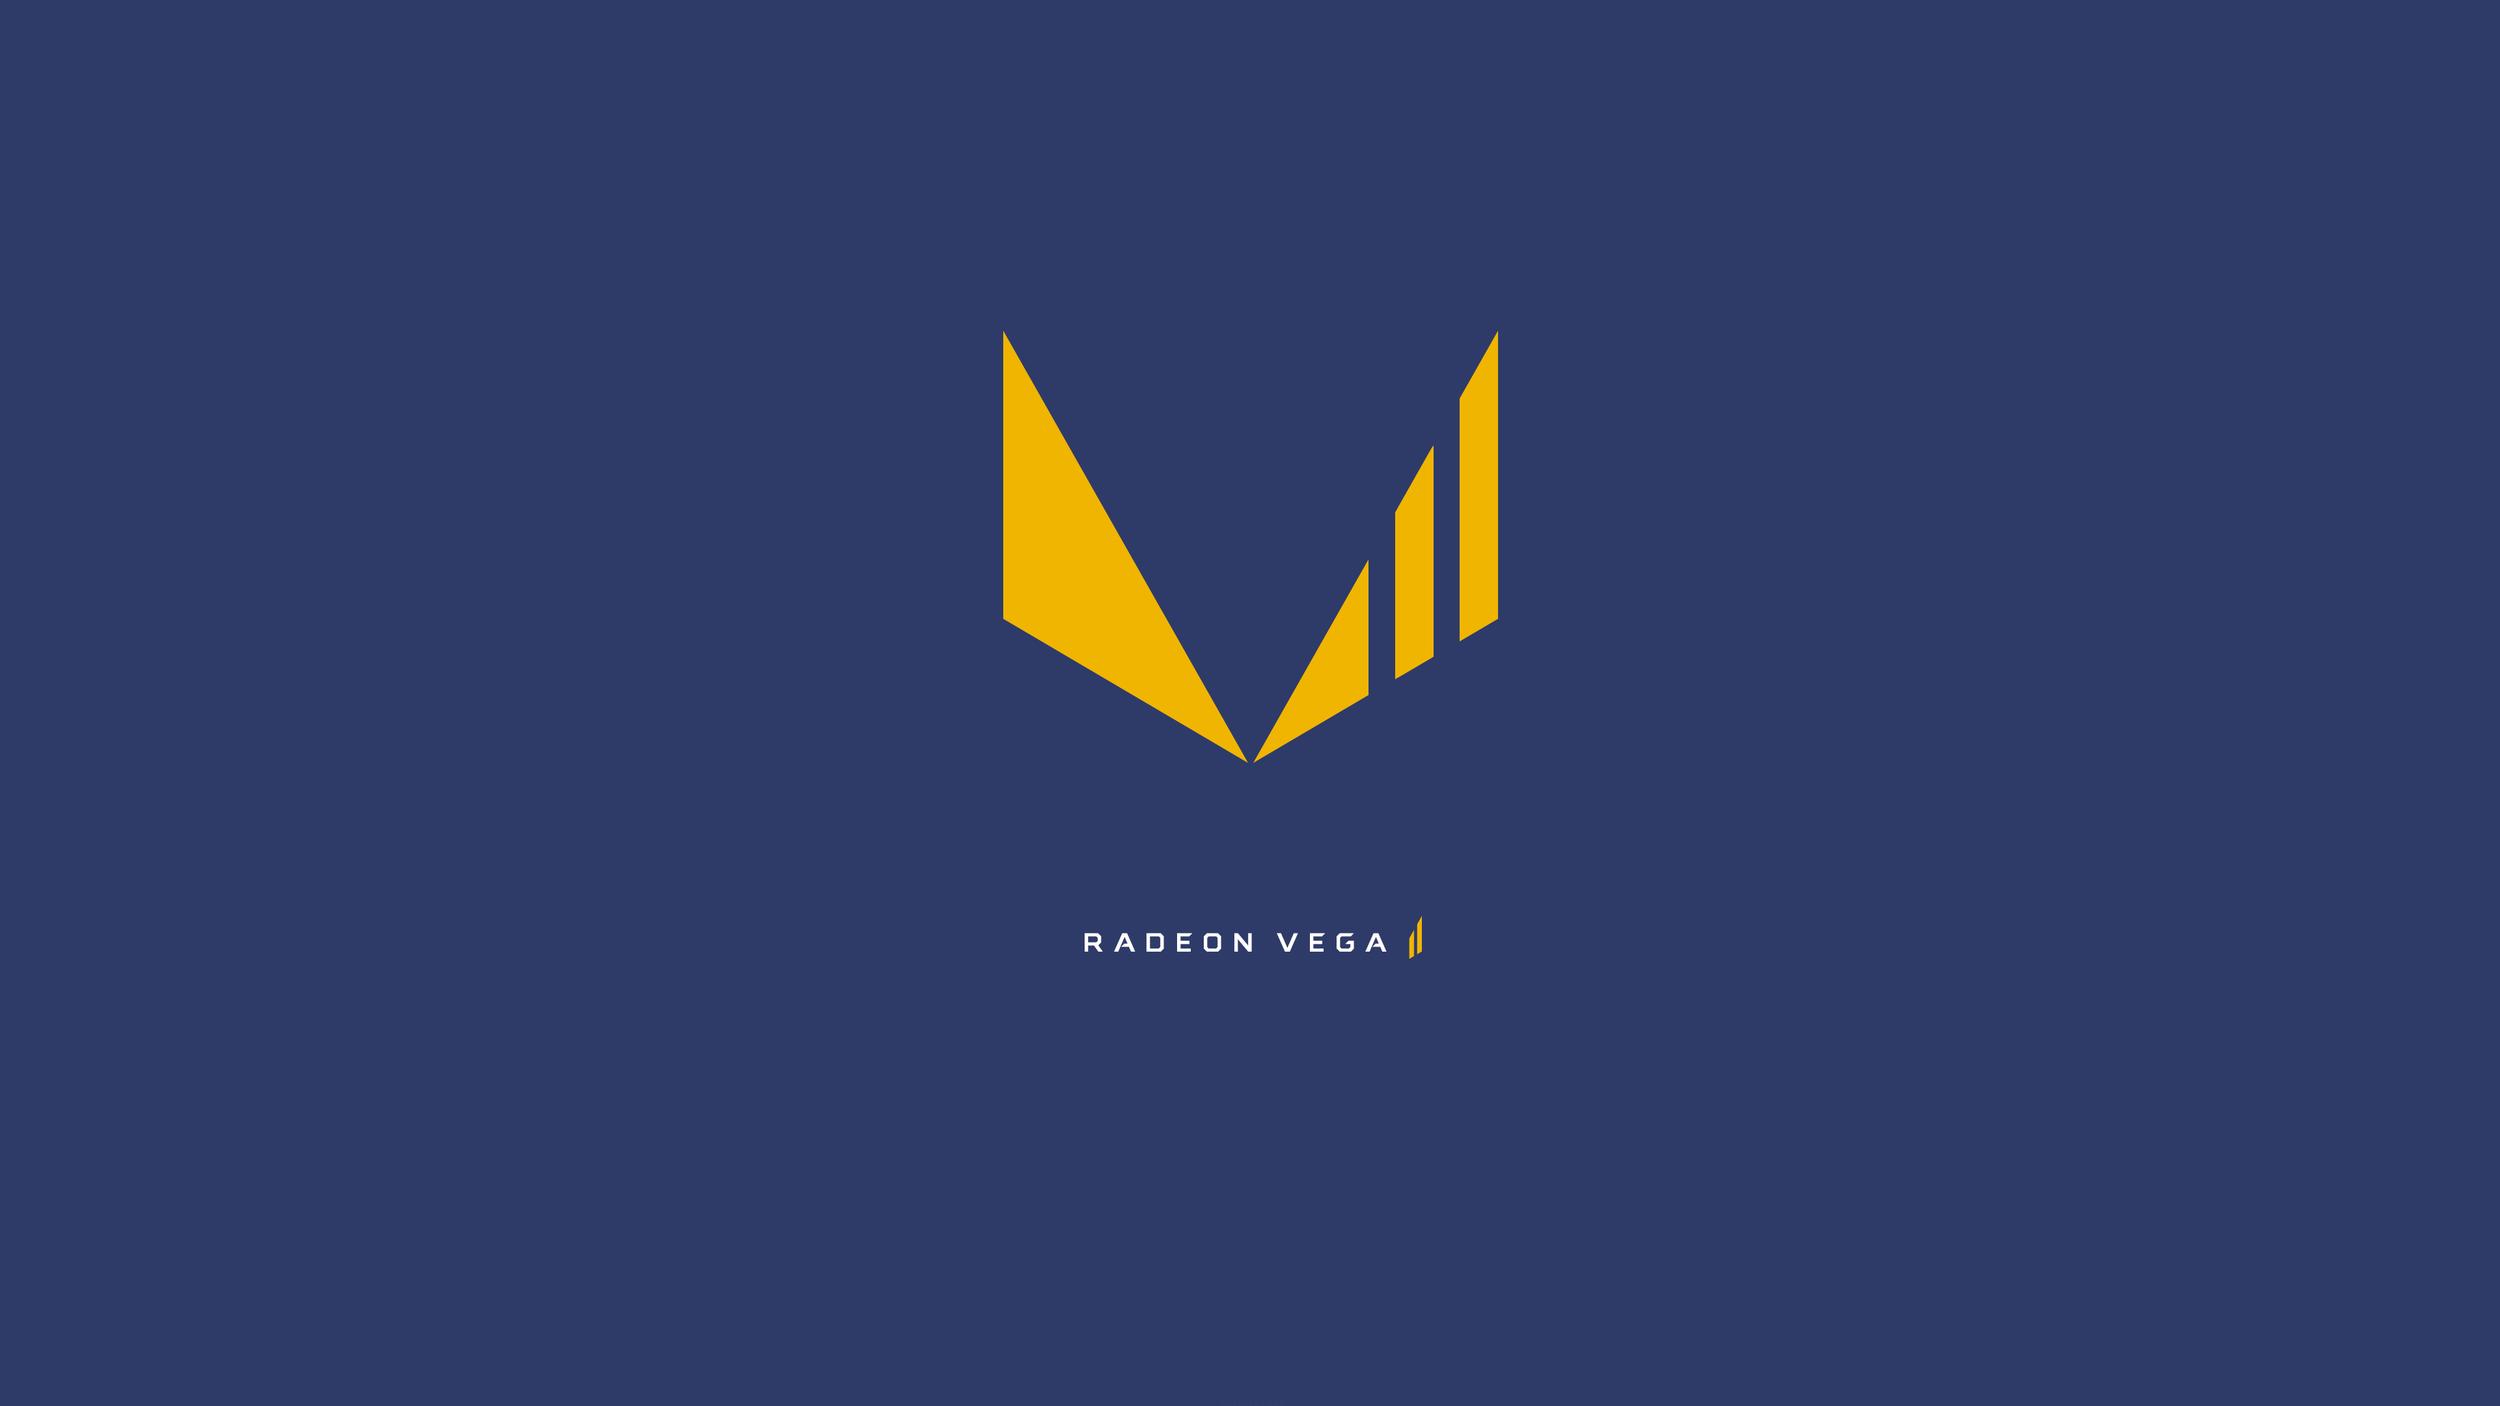 AMD+Radeon+Vega+2+II+Frontier+Edition+Logo+Wallpaper